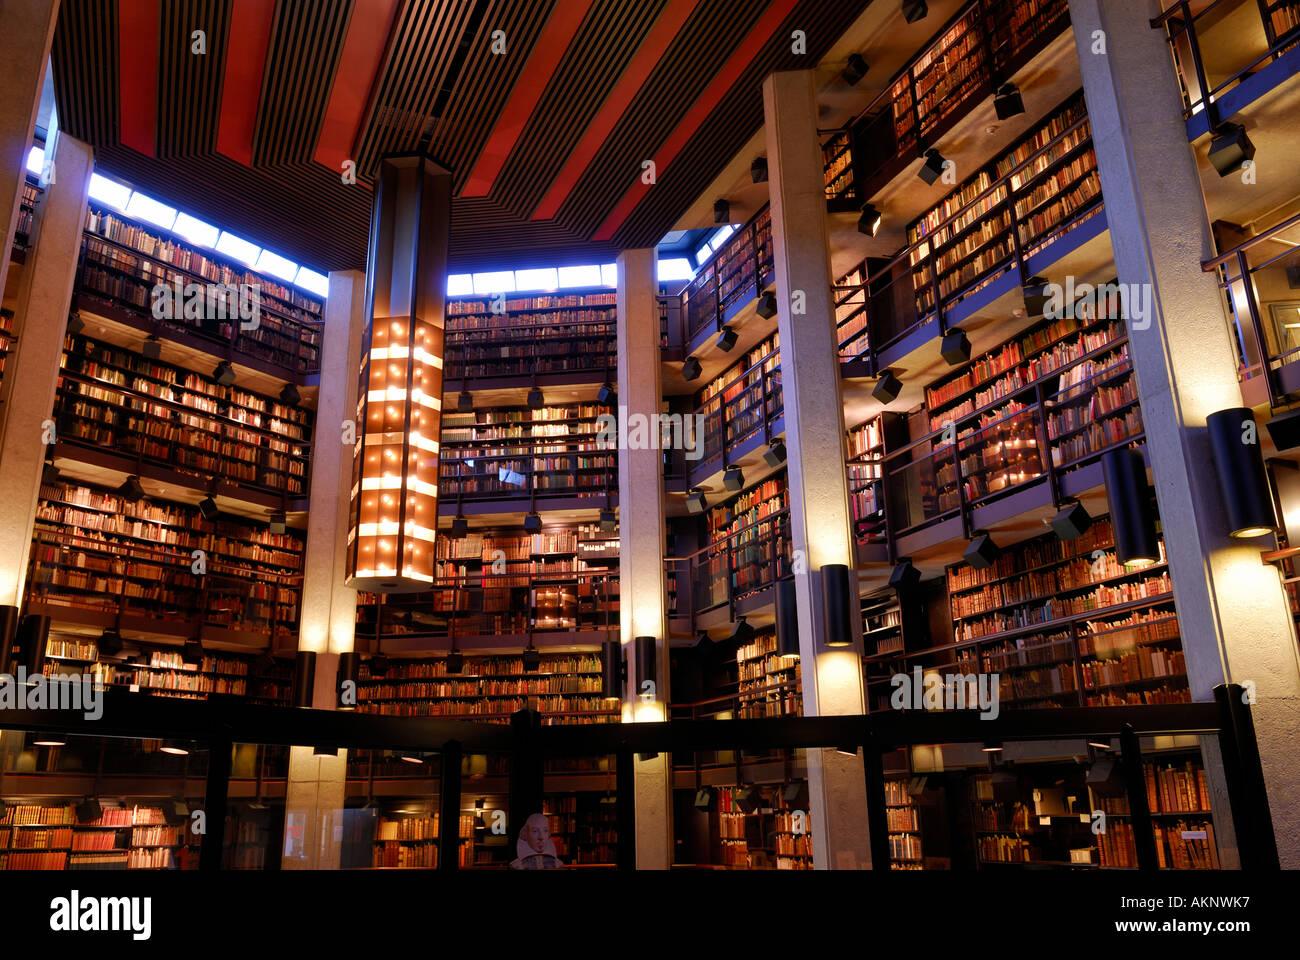 Interior of Thomas Fisher Rare Book Library and Shakespeare University of Toronto - Stock Image